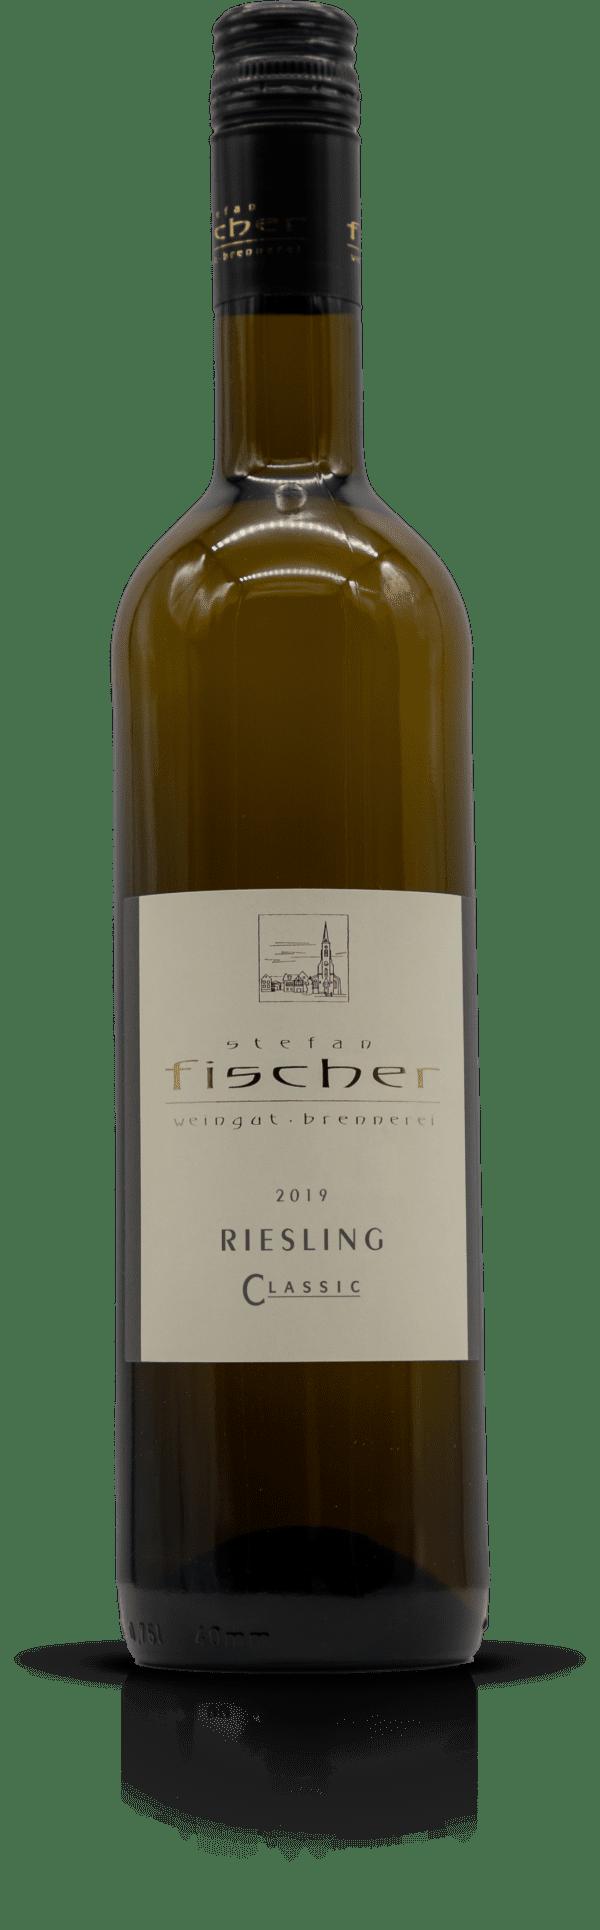 Weingut Stefan Fischer RIESLING classic